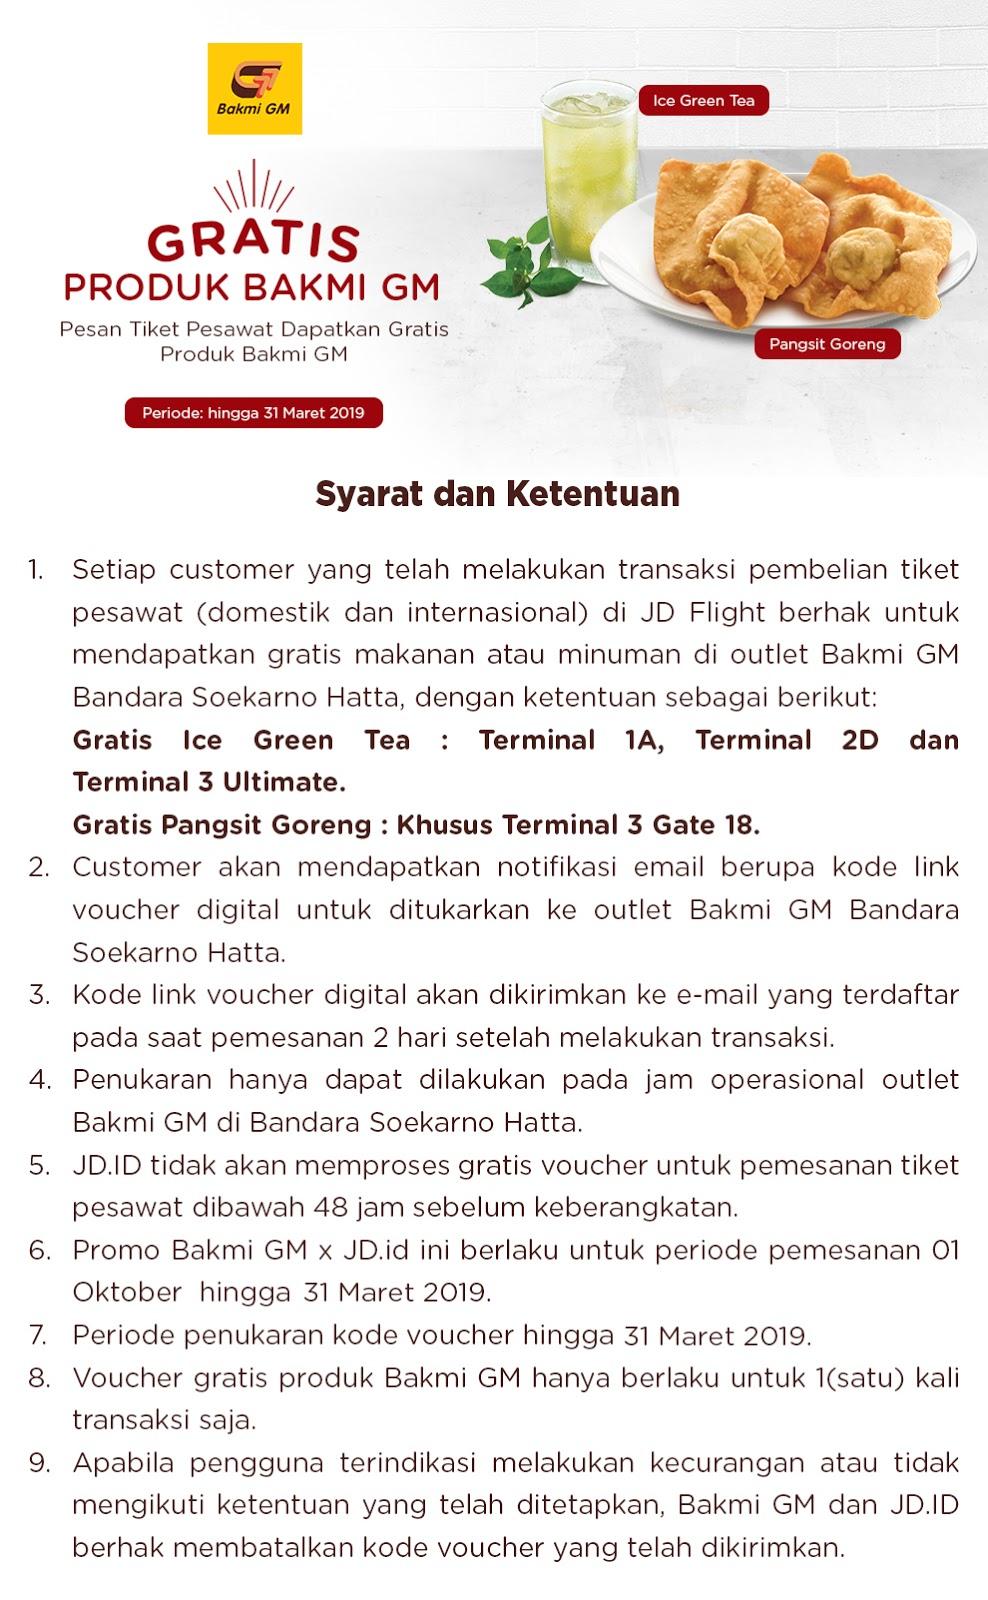 JDID - Promo Beli TIket Pesawat Gratis Produk Bakmi GM (s.d 31 Maret 2019)